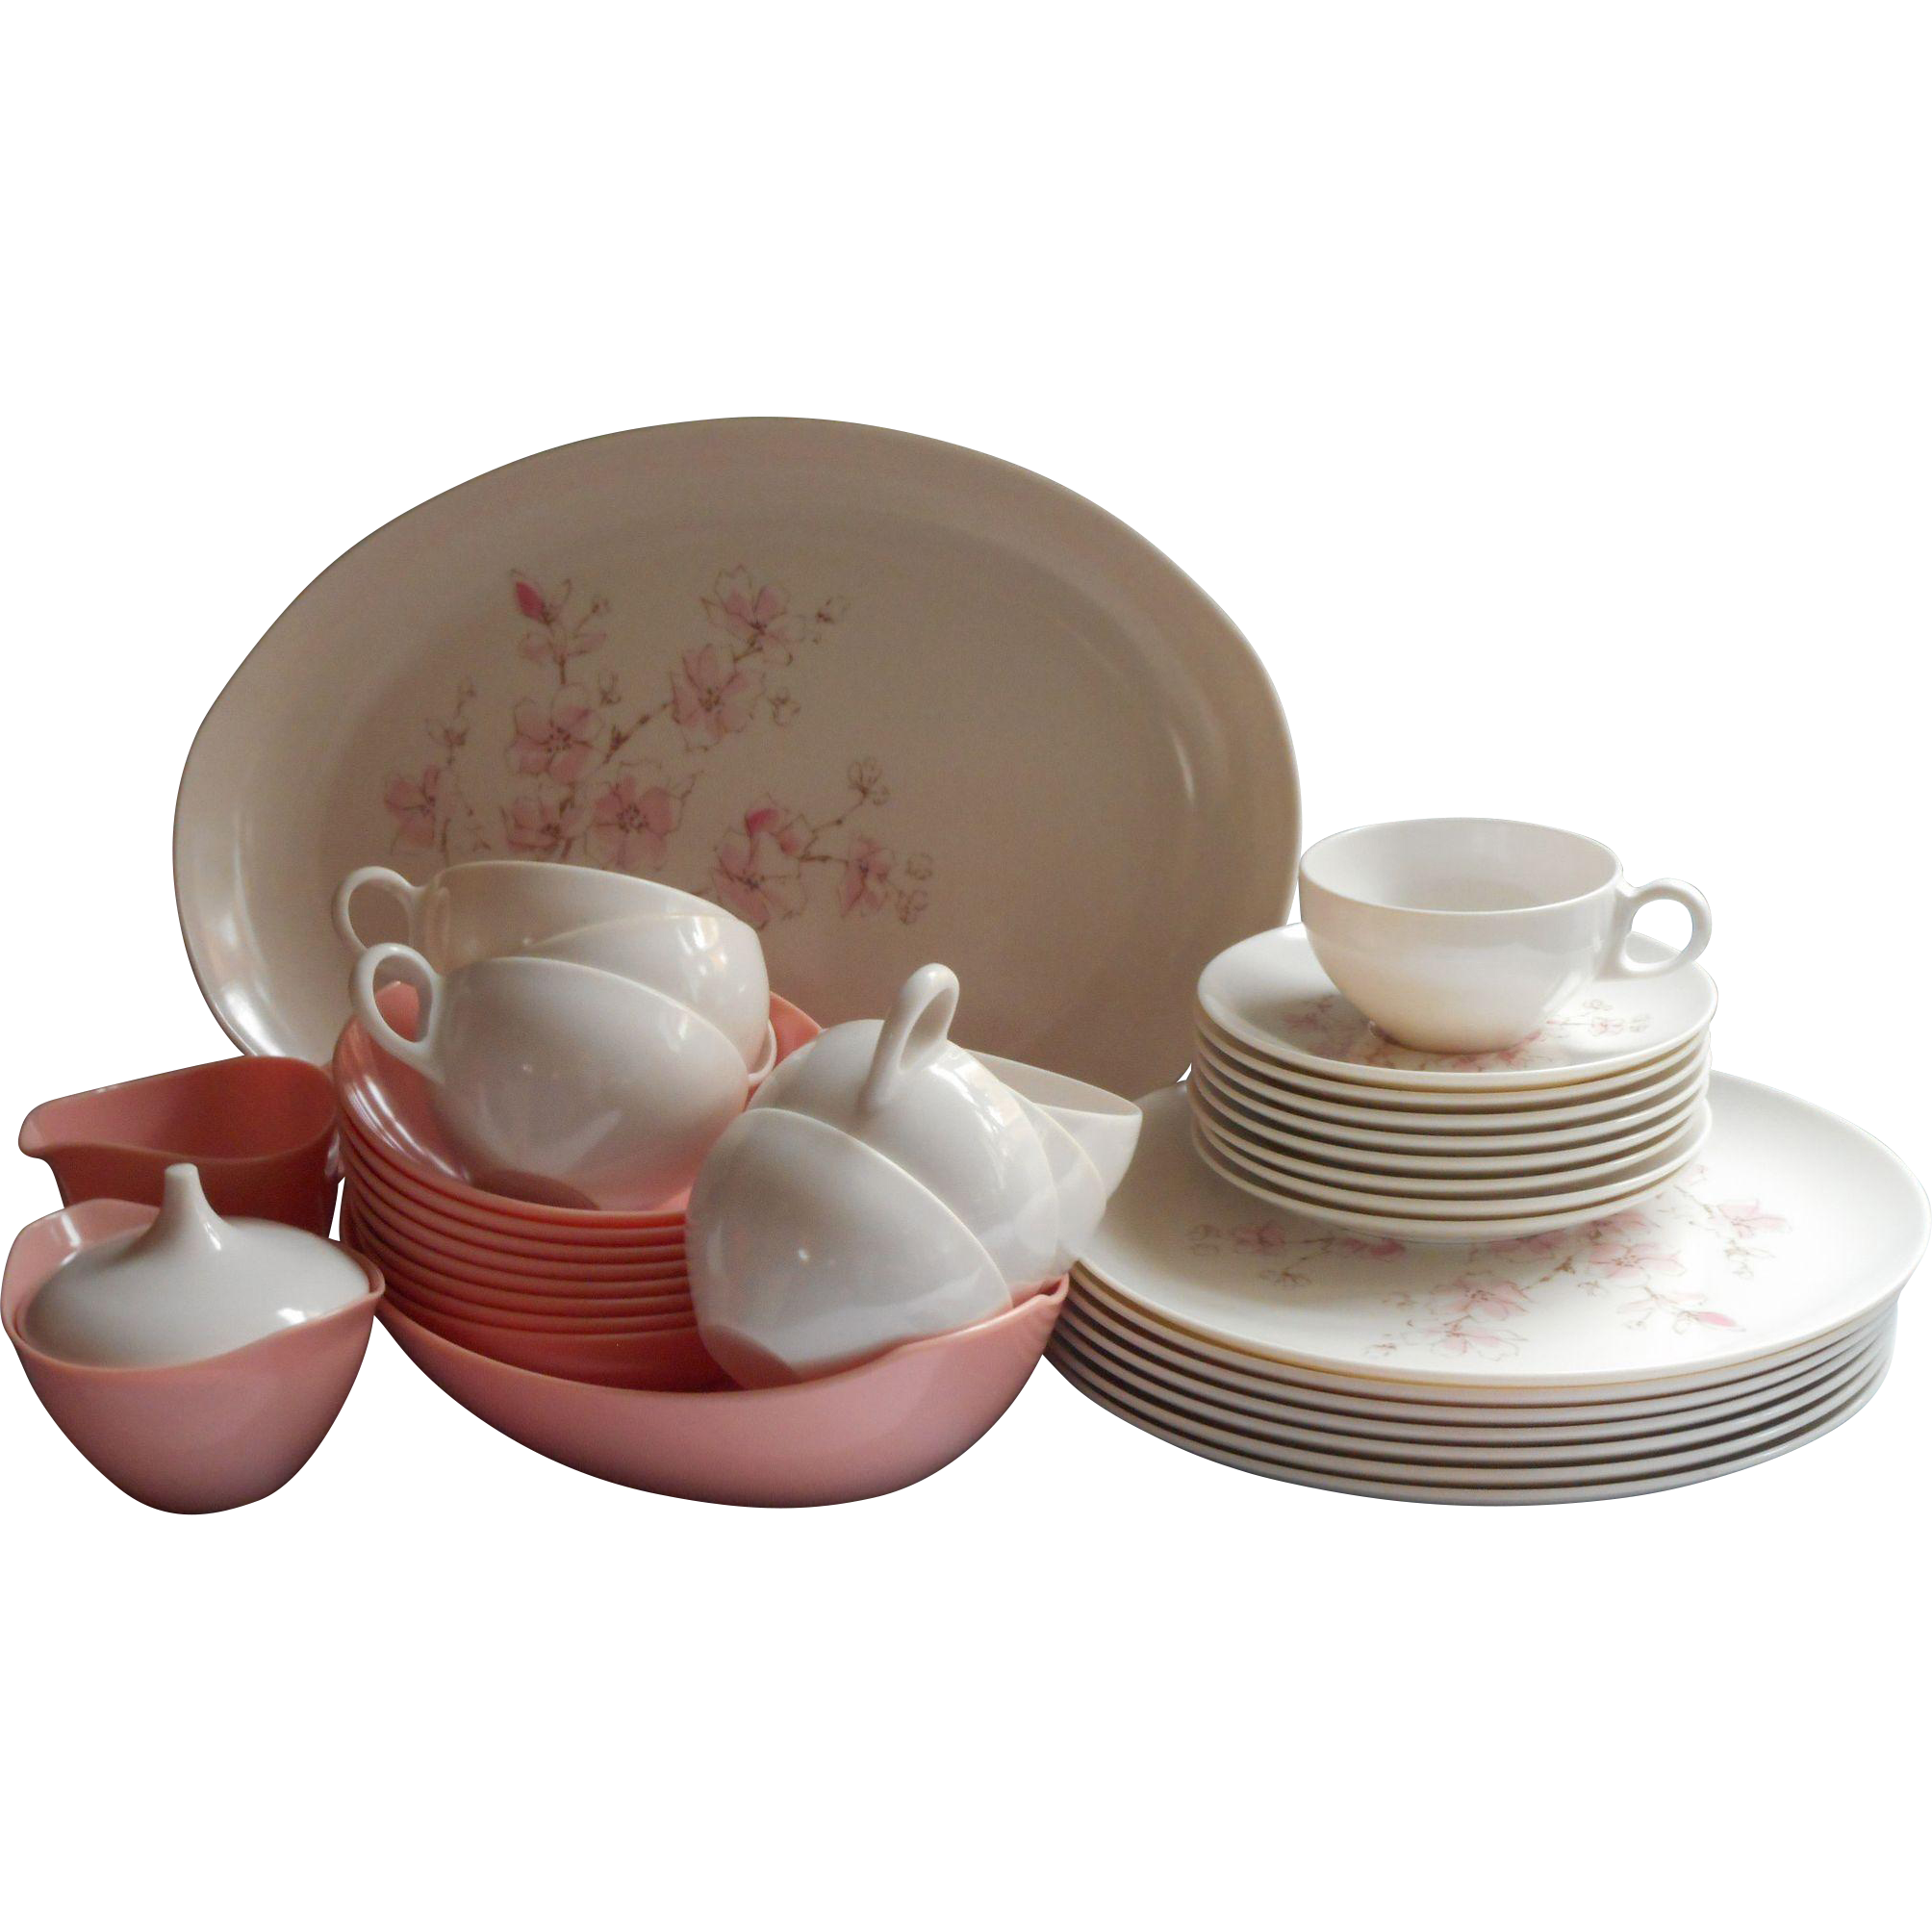 Pink Melamine Set Dishes Oneida Cherry Blossom Vintage Excellent  Mercy Maude! | Ruby Lane  sc 1 st  Ruby Lane & Pink Melamine Set Dishes Oneida Cherry Blossom Vintage Excellent ...